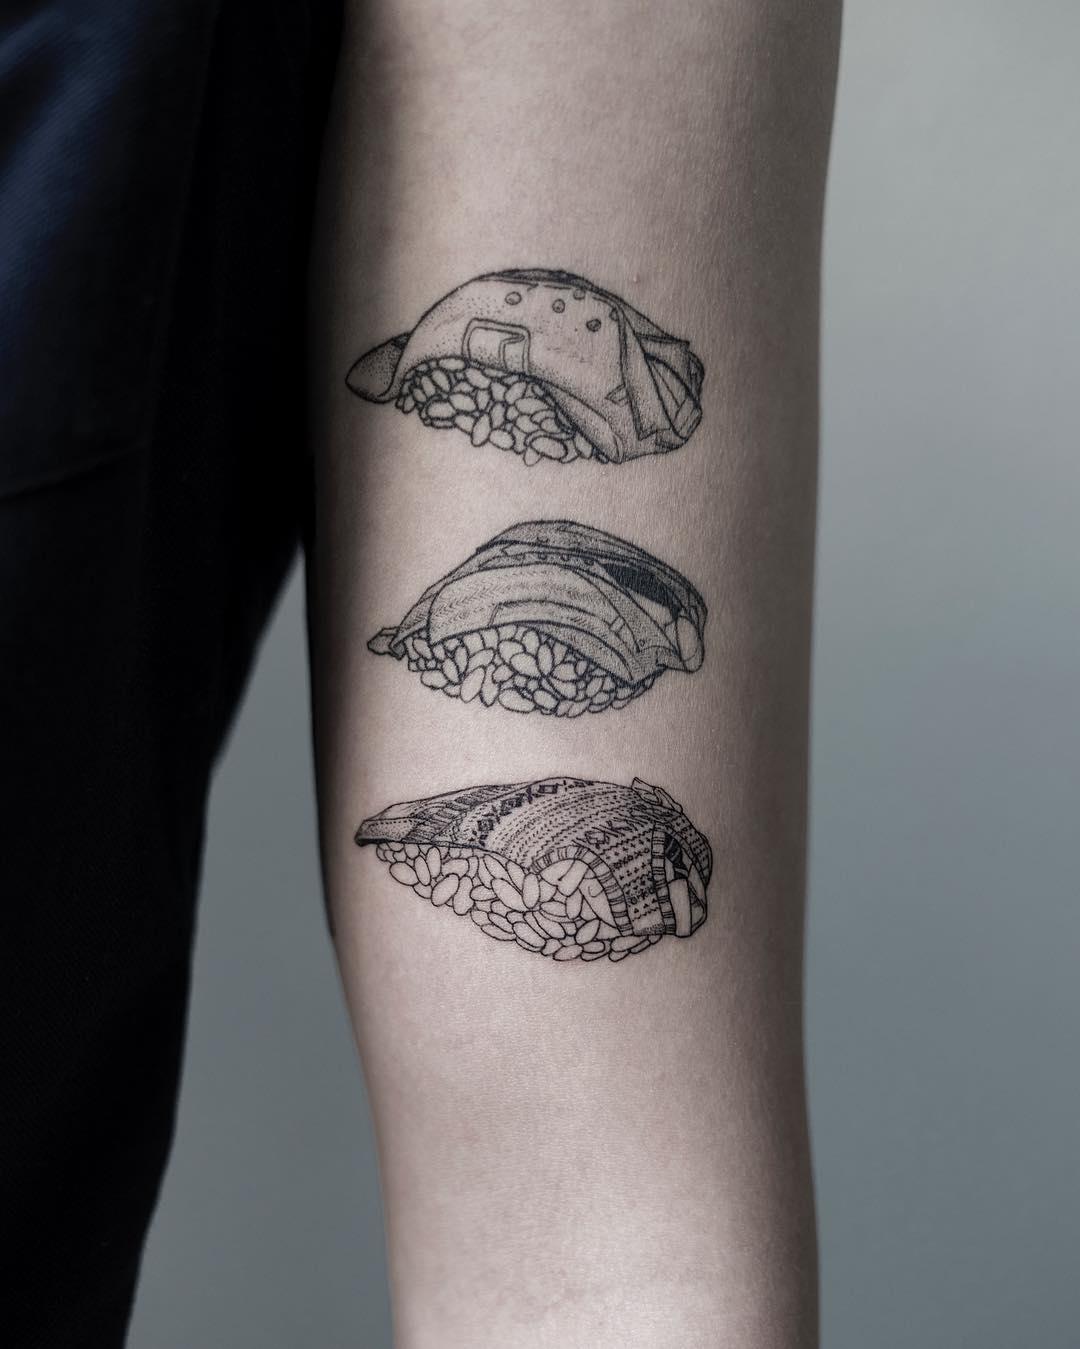 Sushi dress by tattooist Oozy